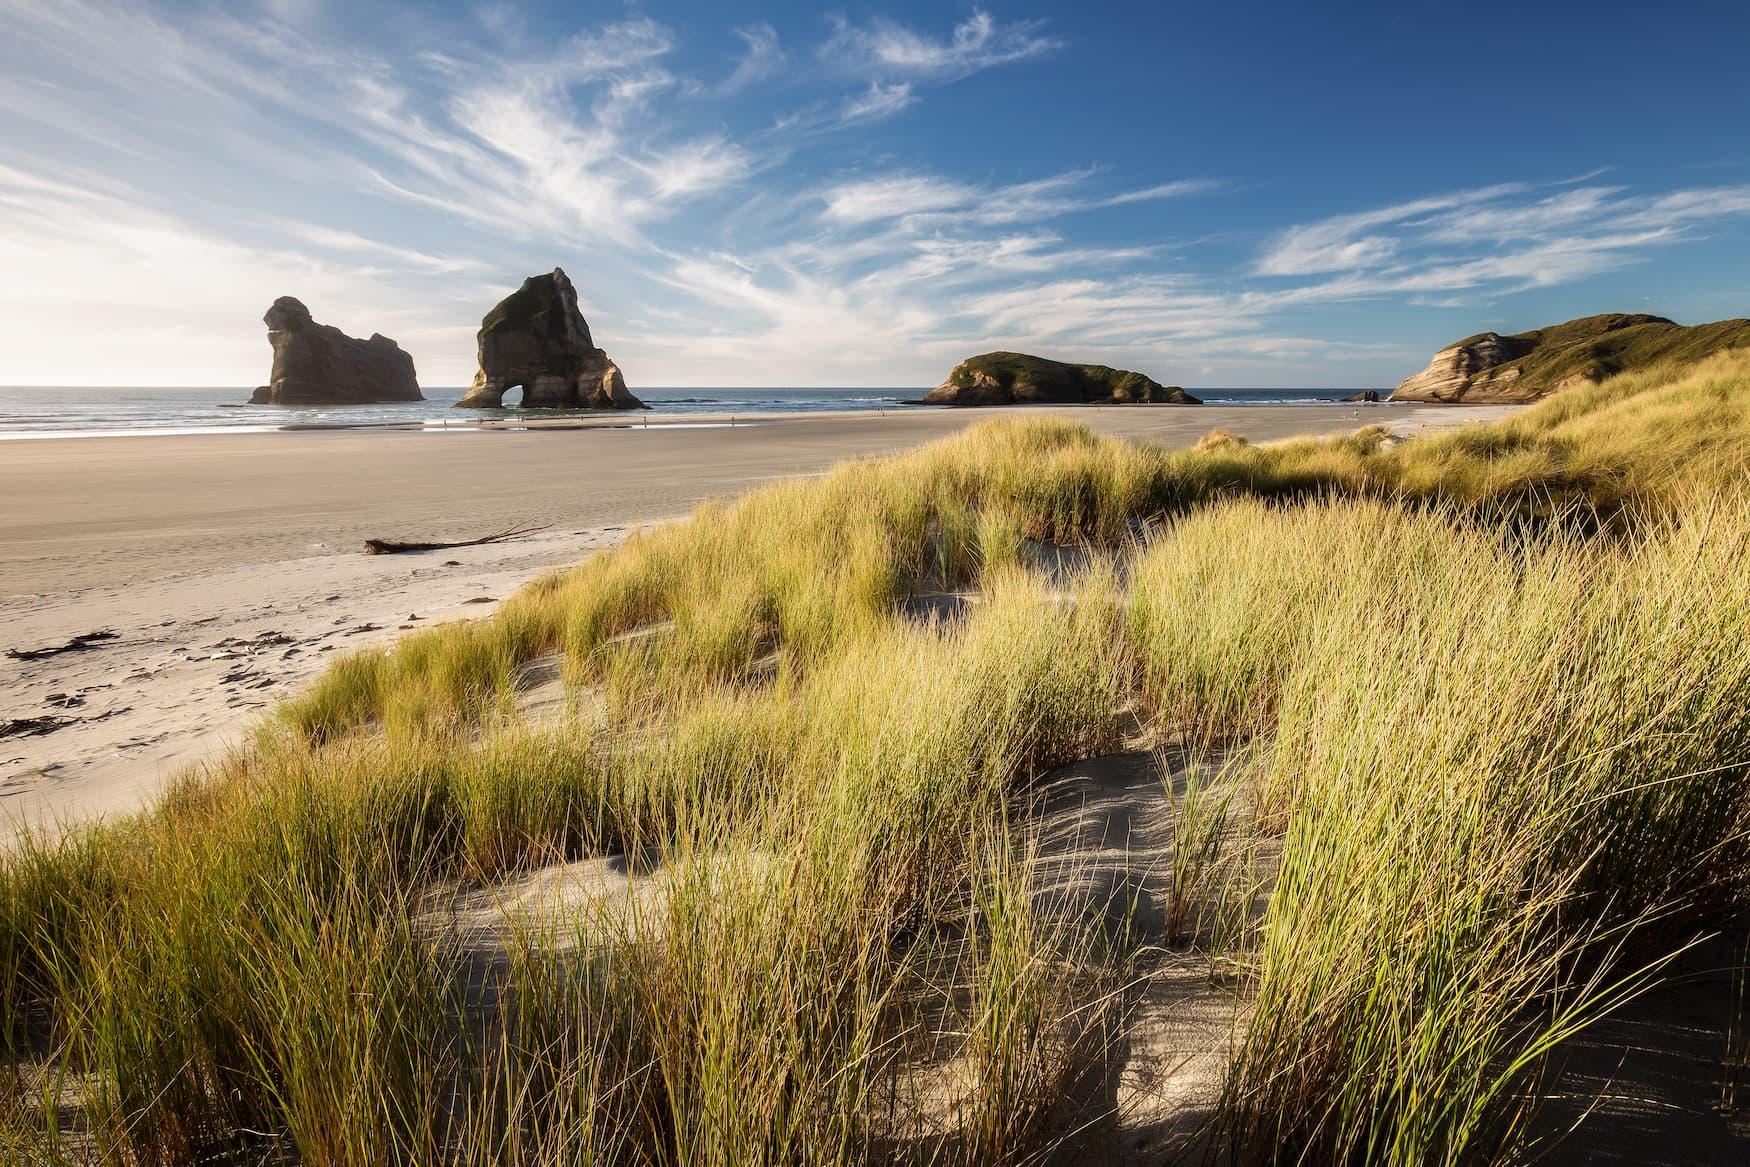 Dünen und Felsen am Wharariki Beach in Neuseeland